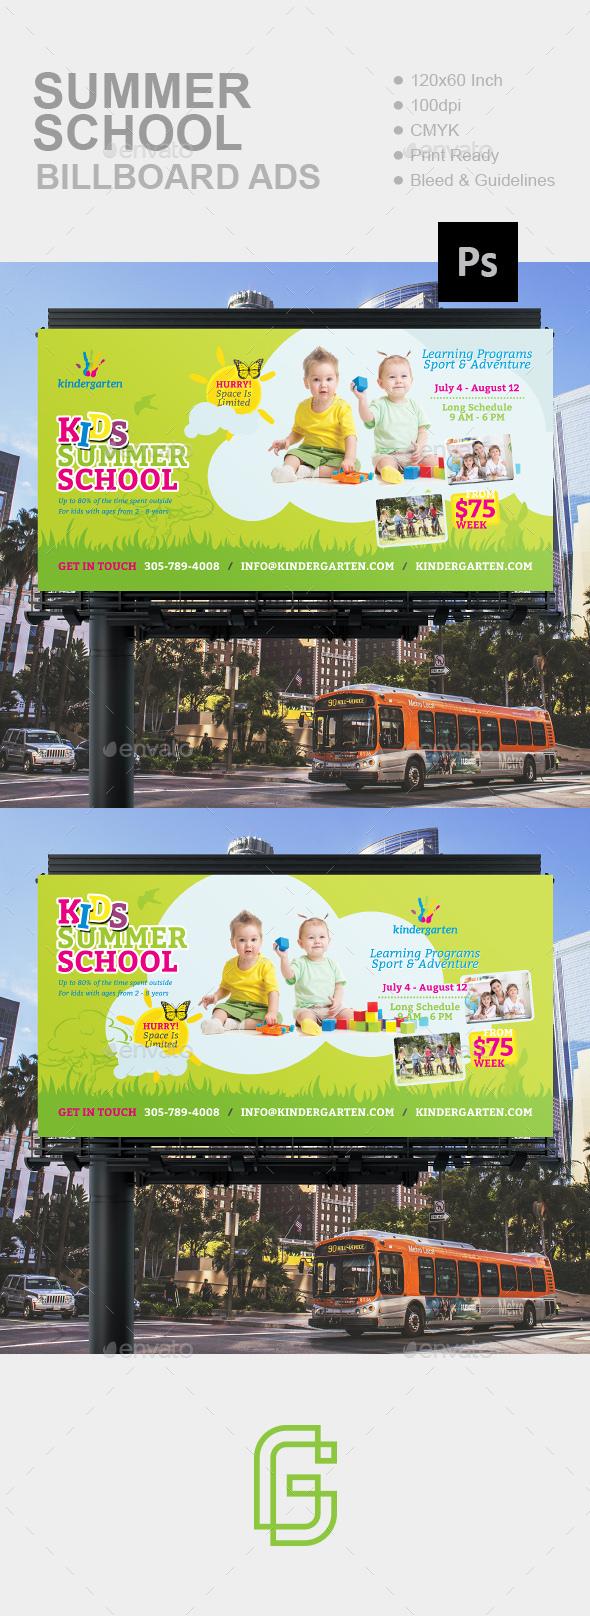 Summer School Billboard